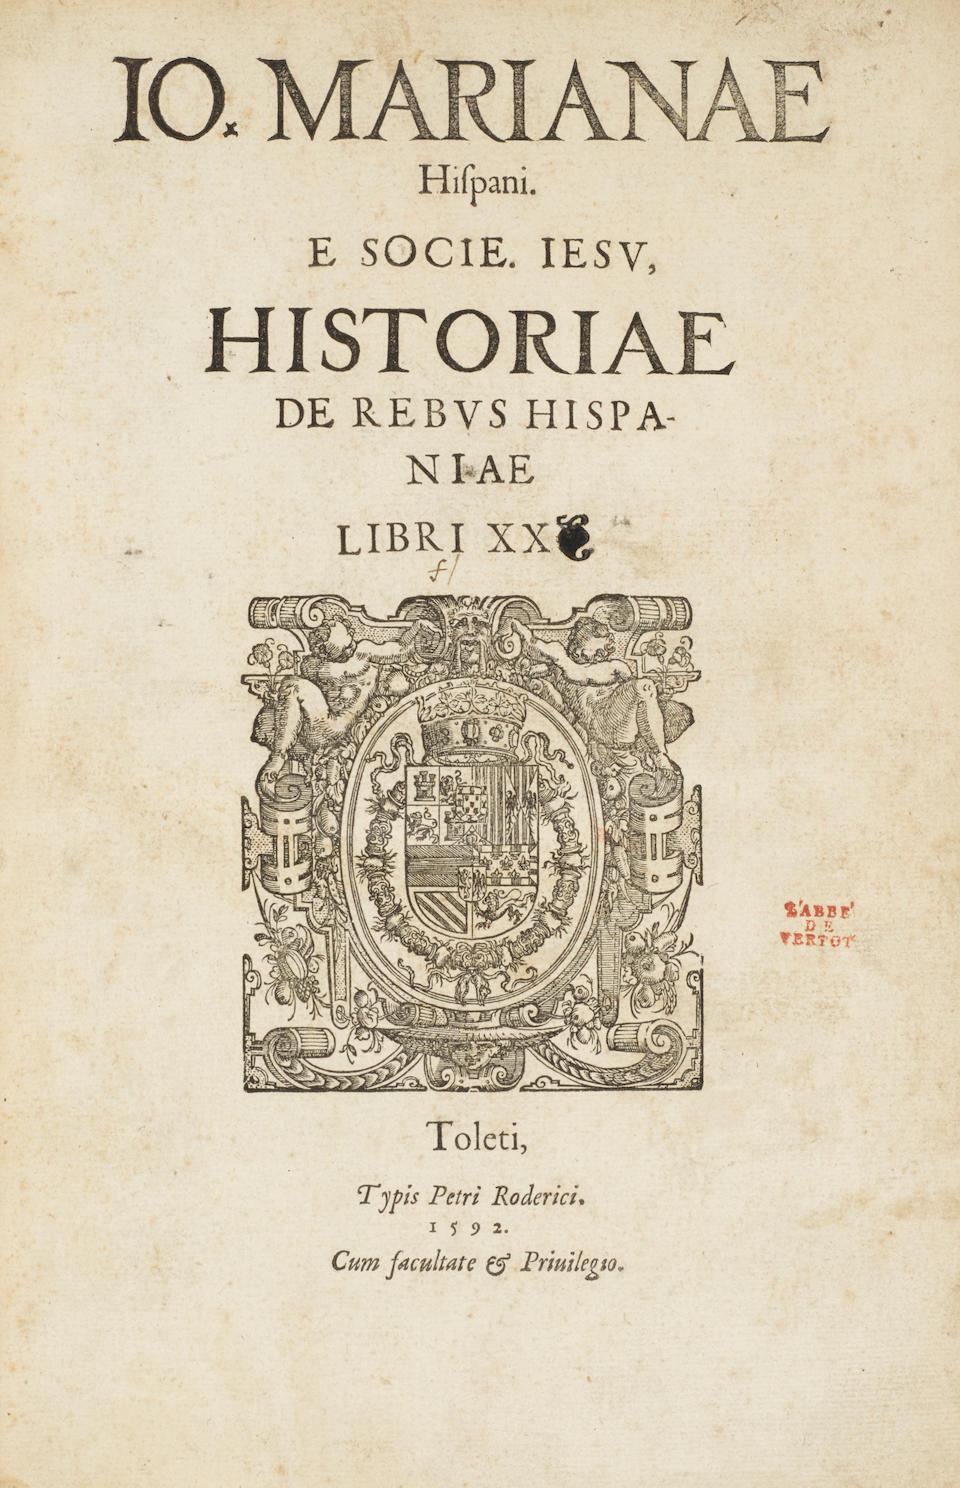 MARIANA, JUAN DE. 1536-1624. Historiae de rebus Hispaniae libri XX.  Toldedo: Pedro Rodriguez, 1592.